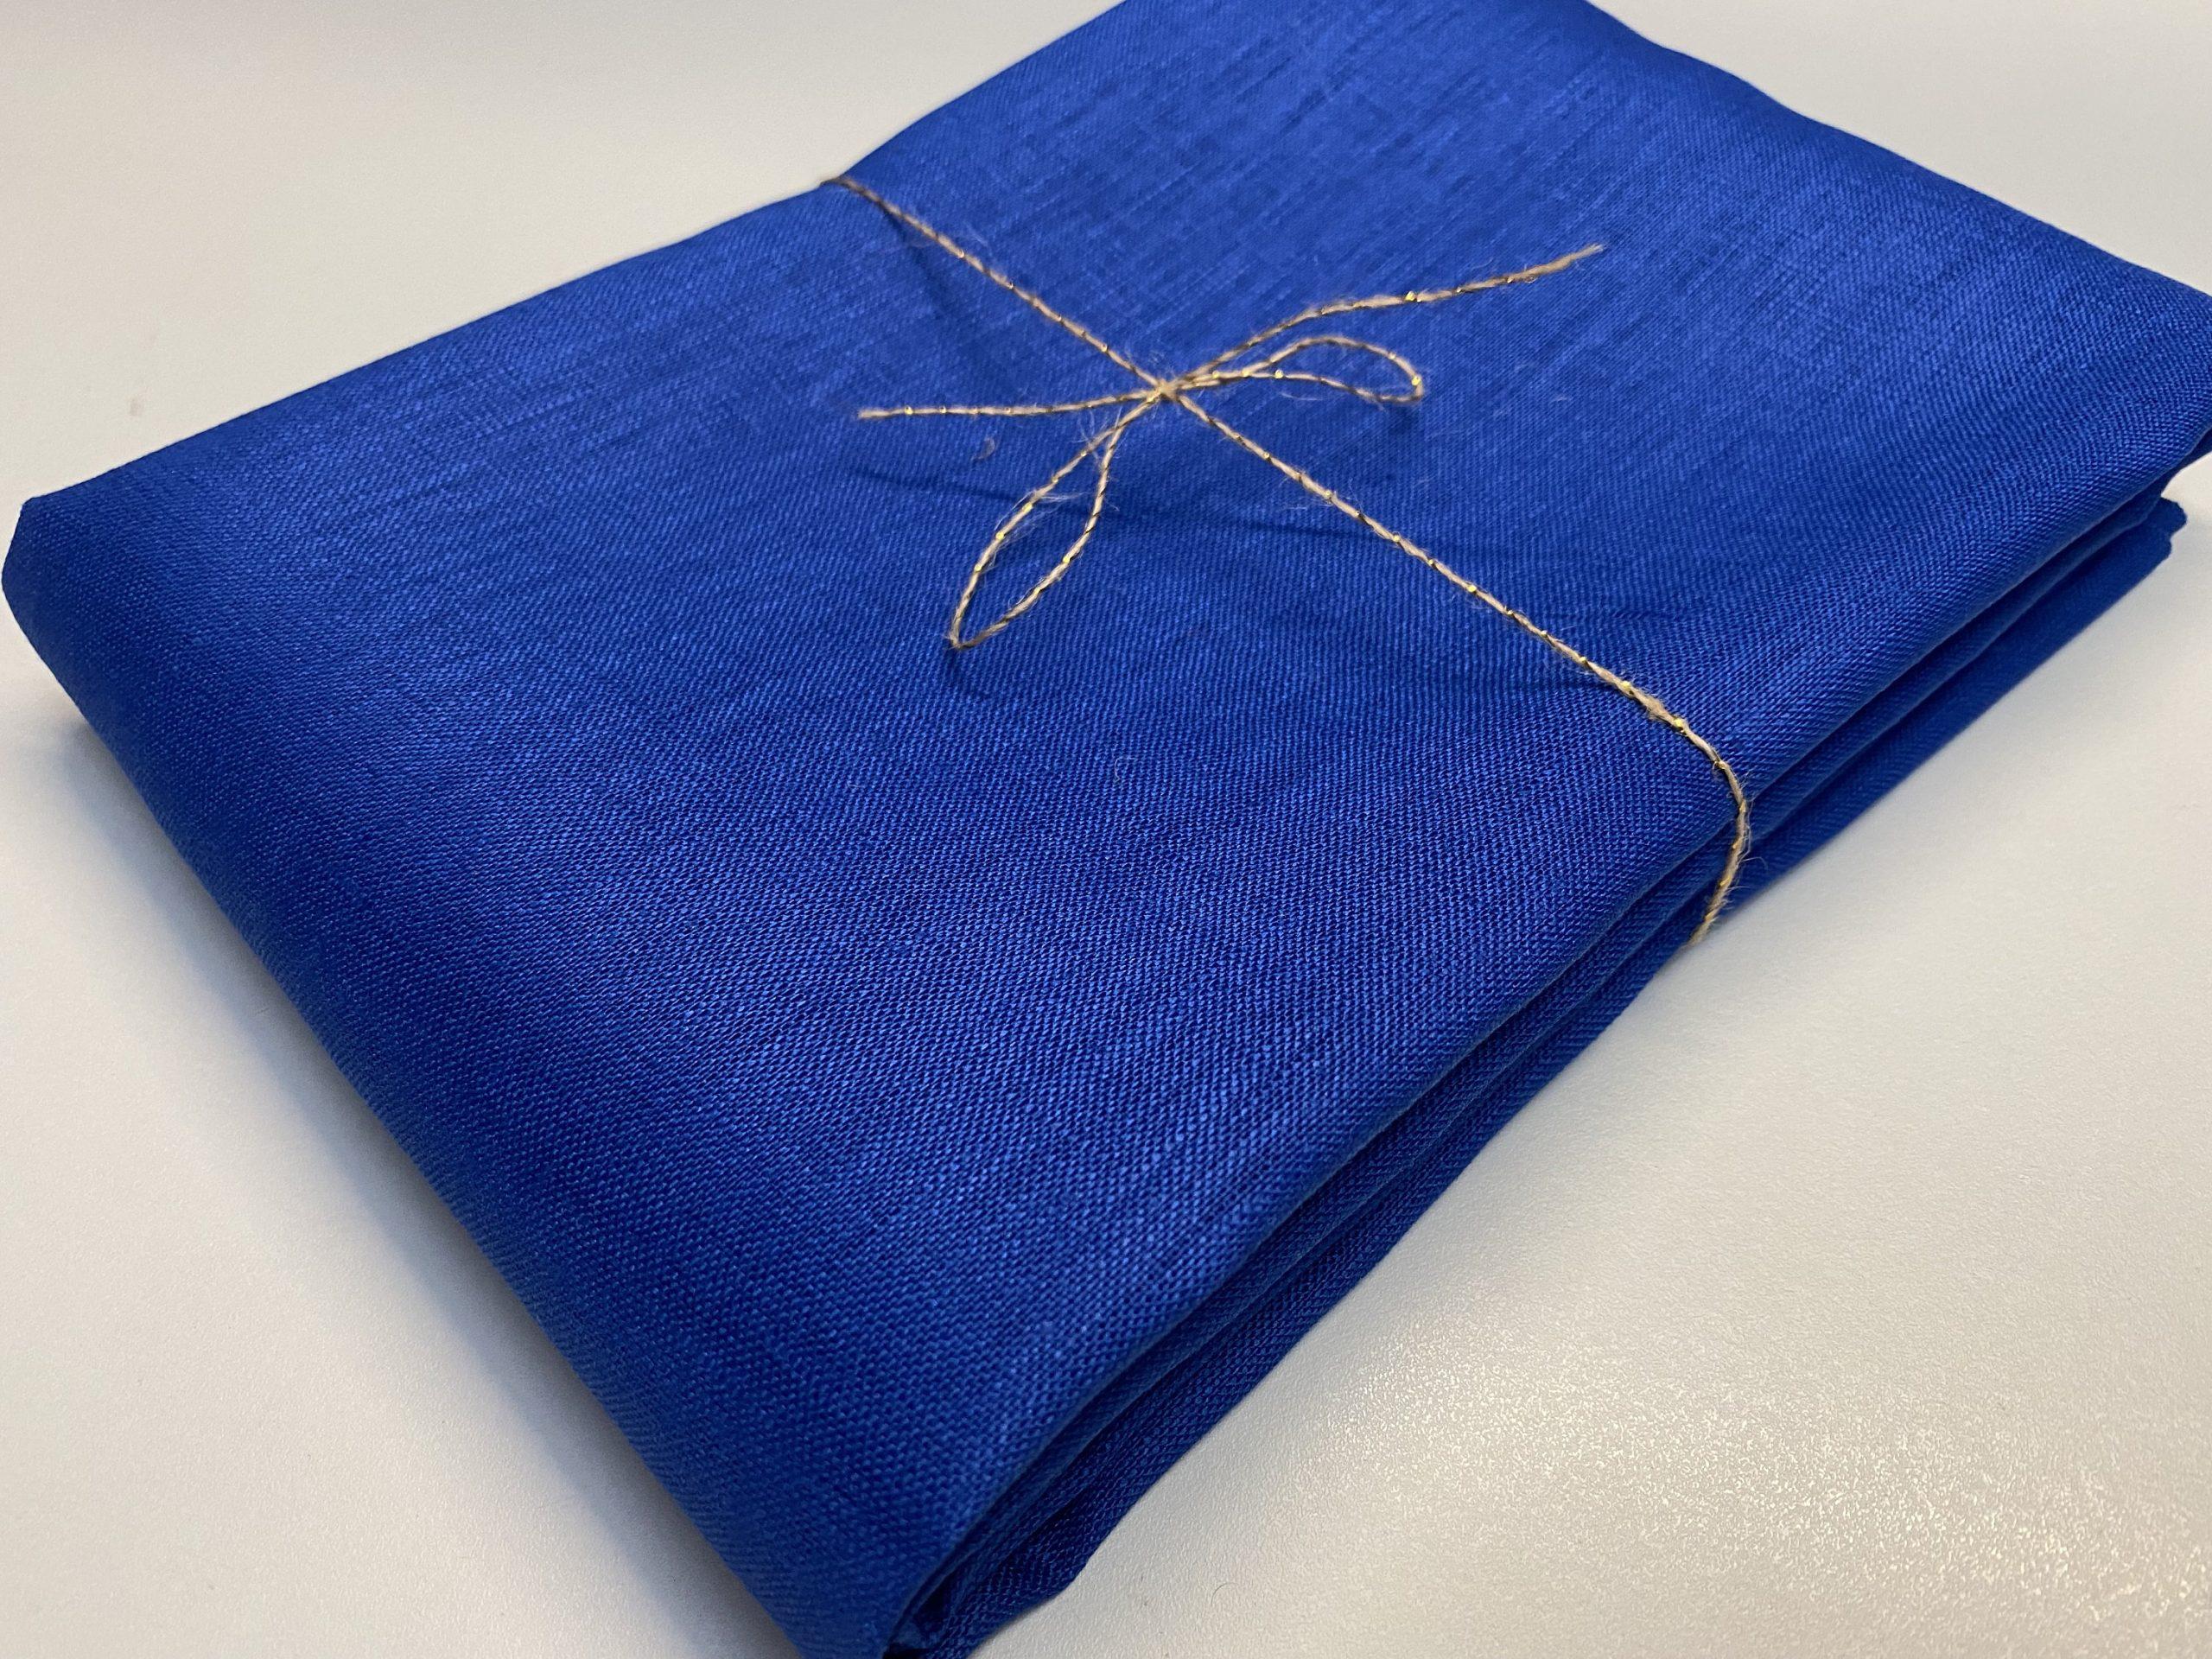 Soft Linen Fabric Material –  100% Linen for Home Decor, Curtains, Clothes – 140cm wide – Plain ROYAL BLUE